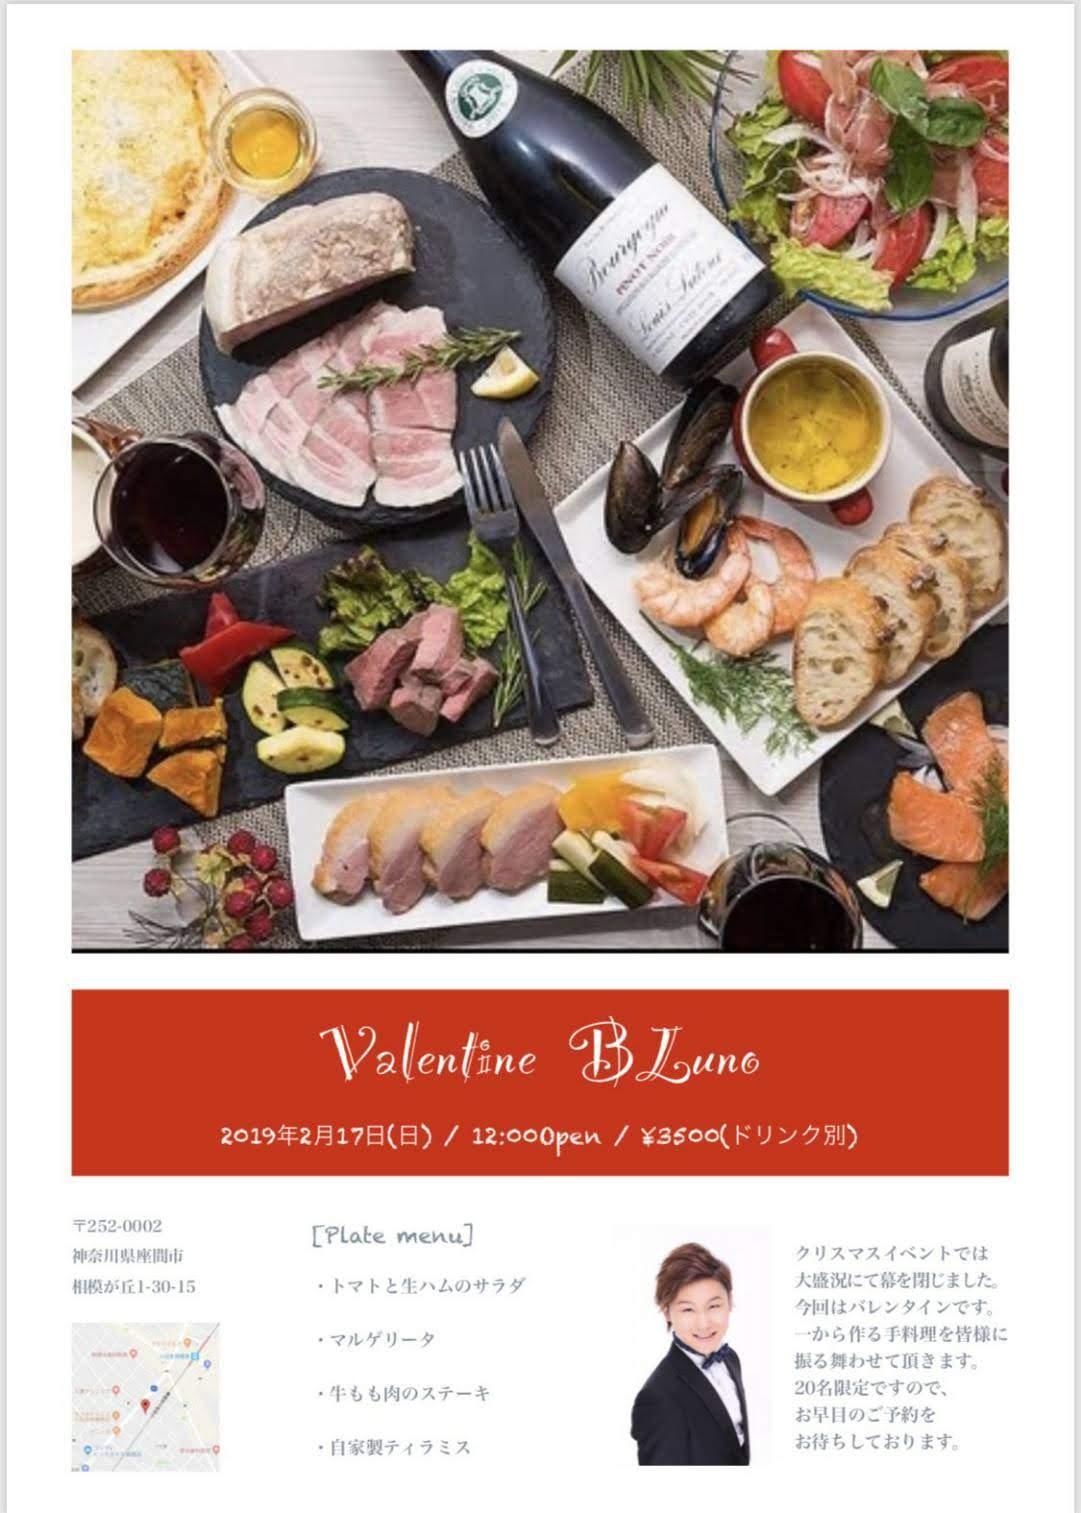 Valentine BLuno